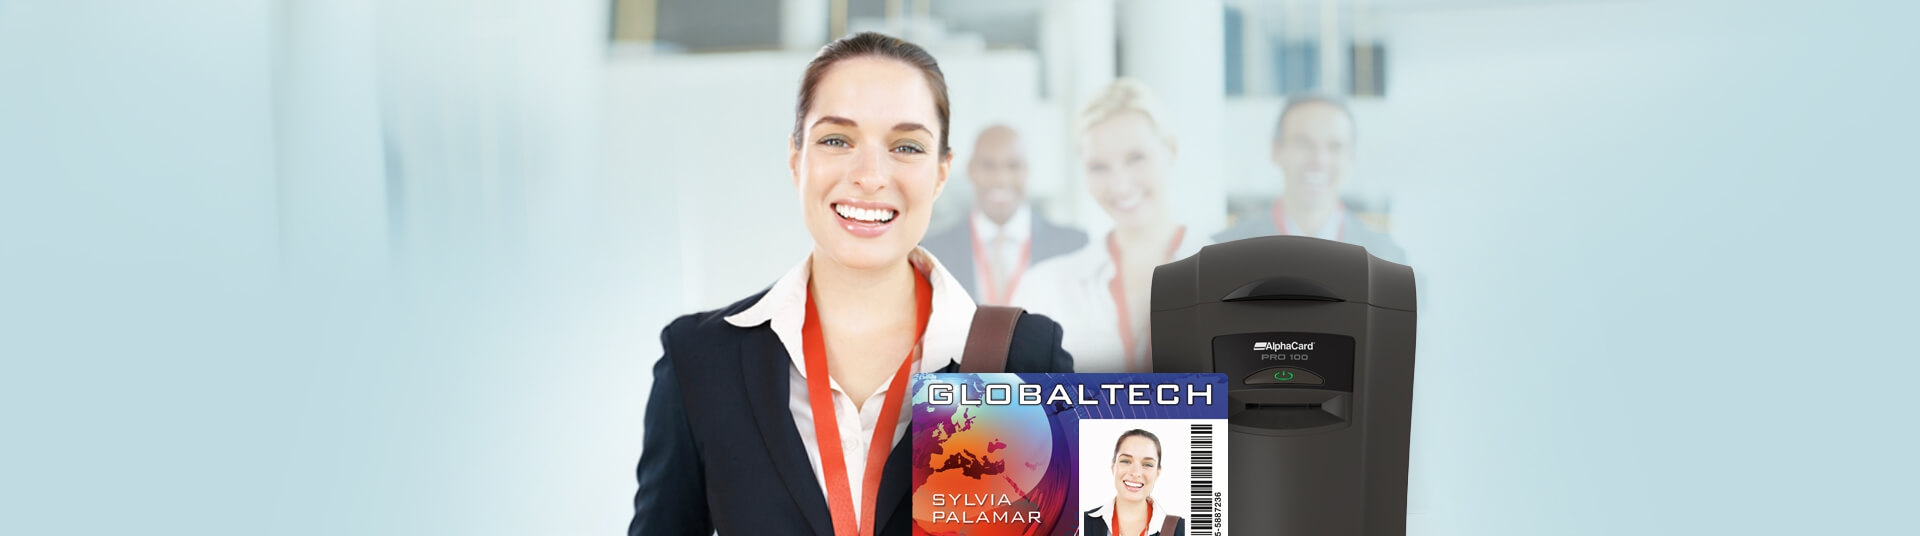 Employee Badges